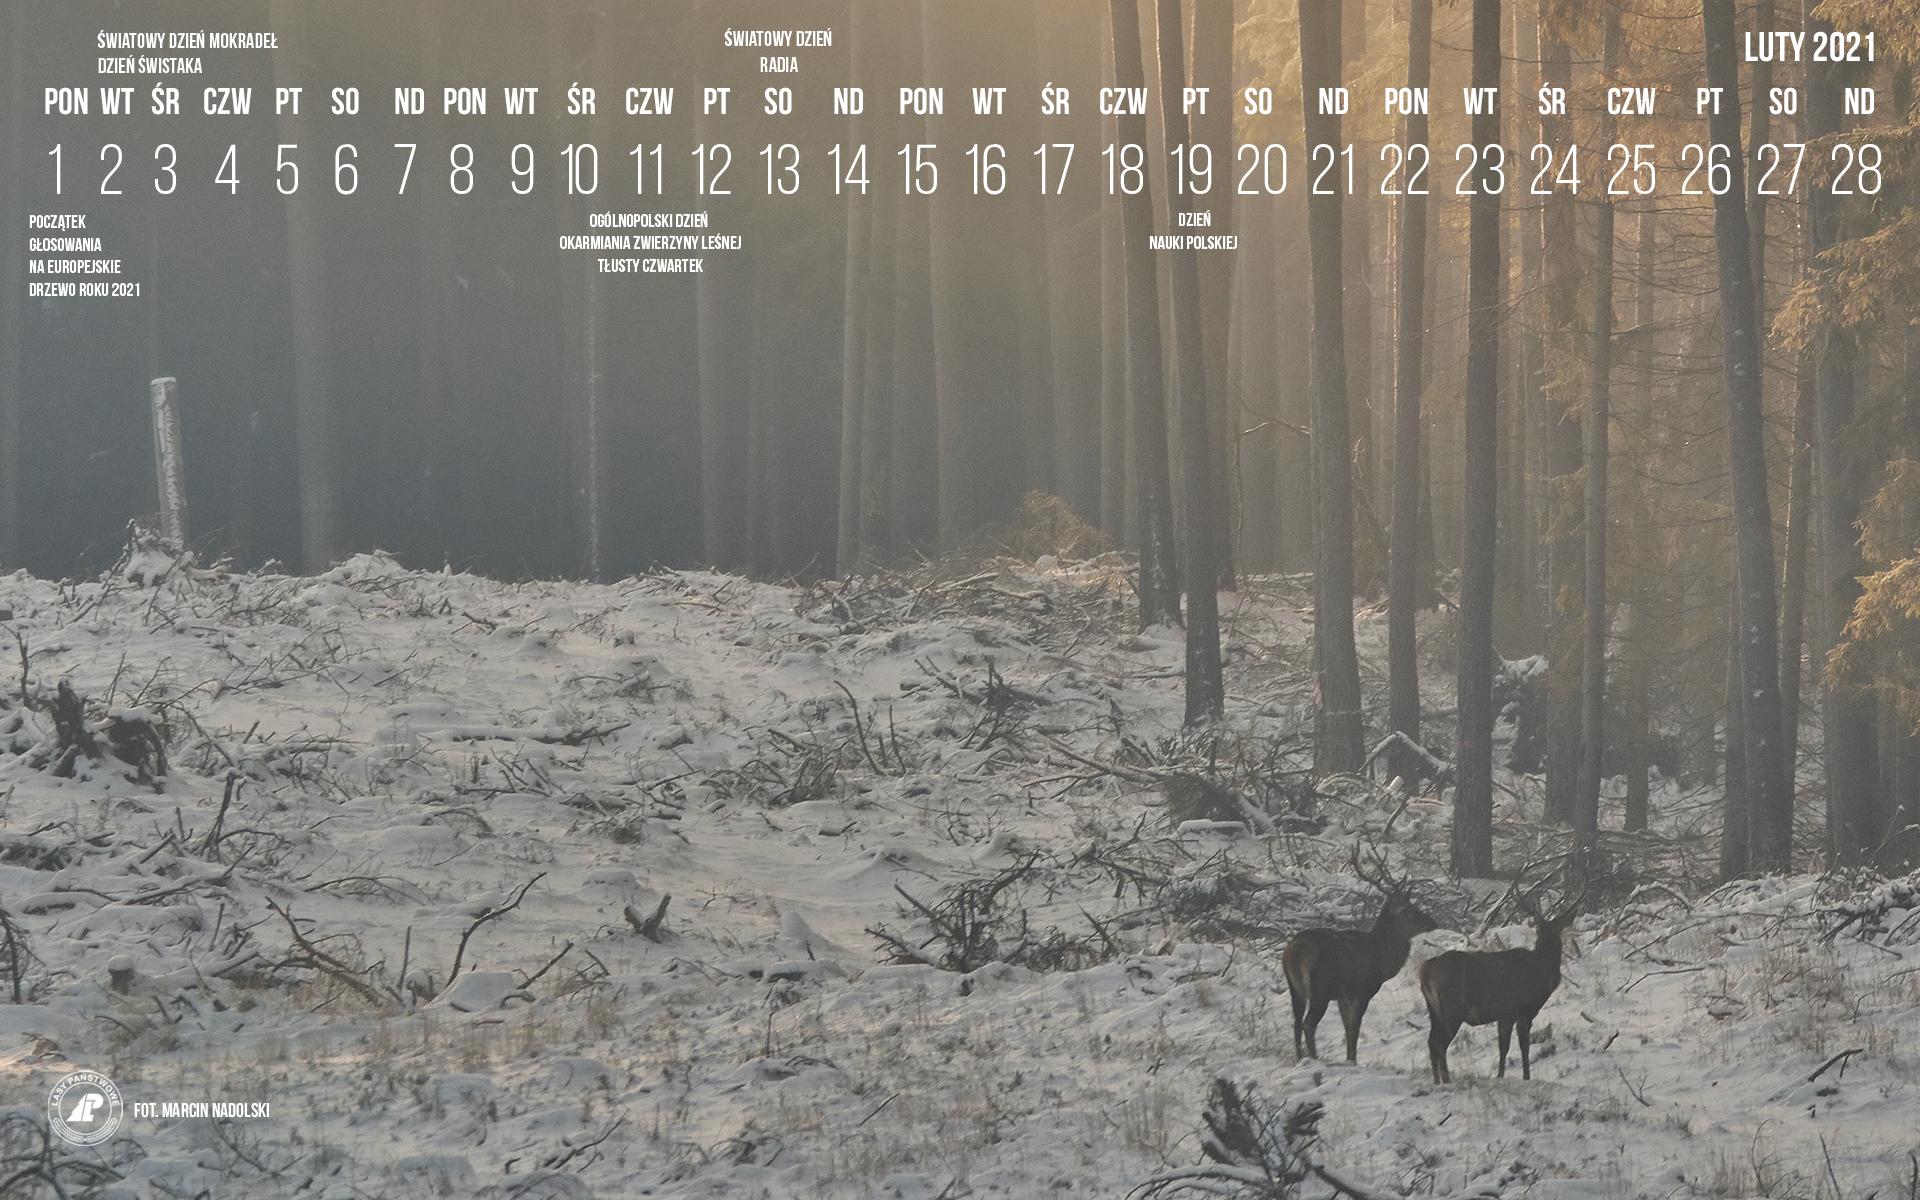 02-2021_1920X1200[1].jpg